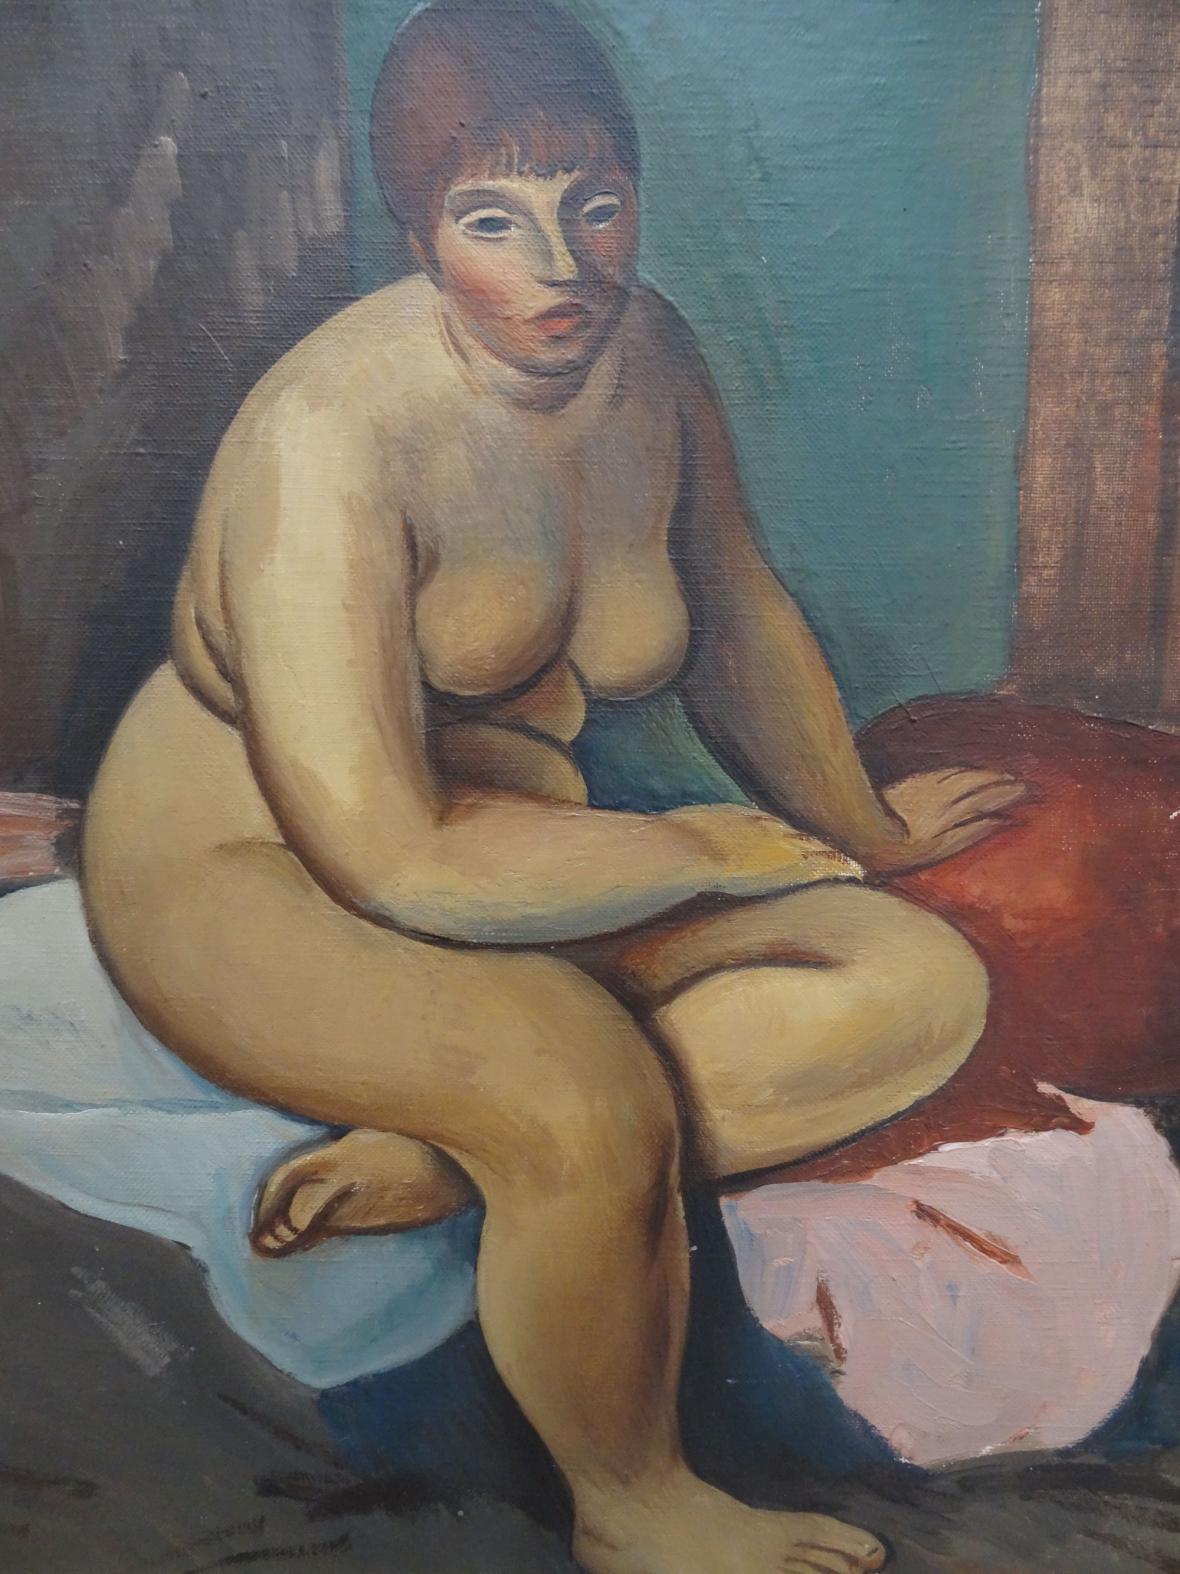 Alfréd Justitz / Akt, 1924